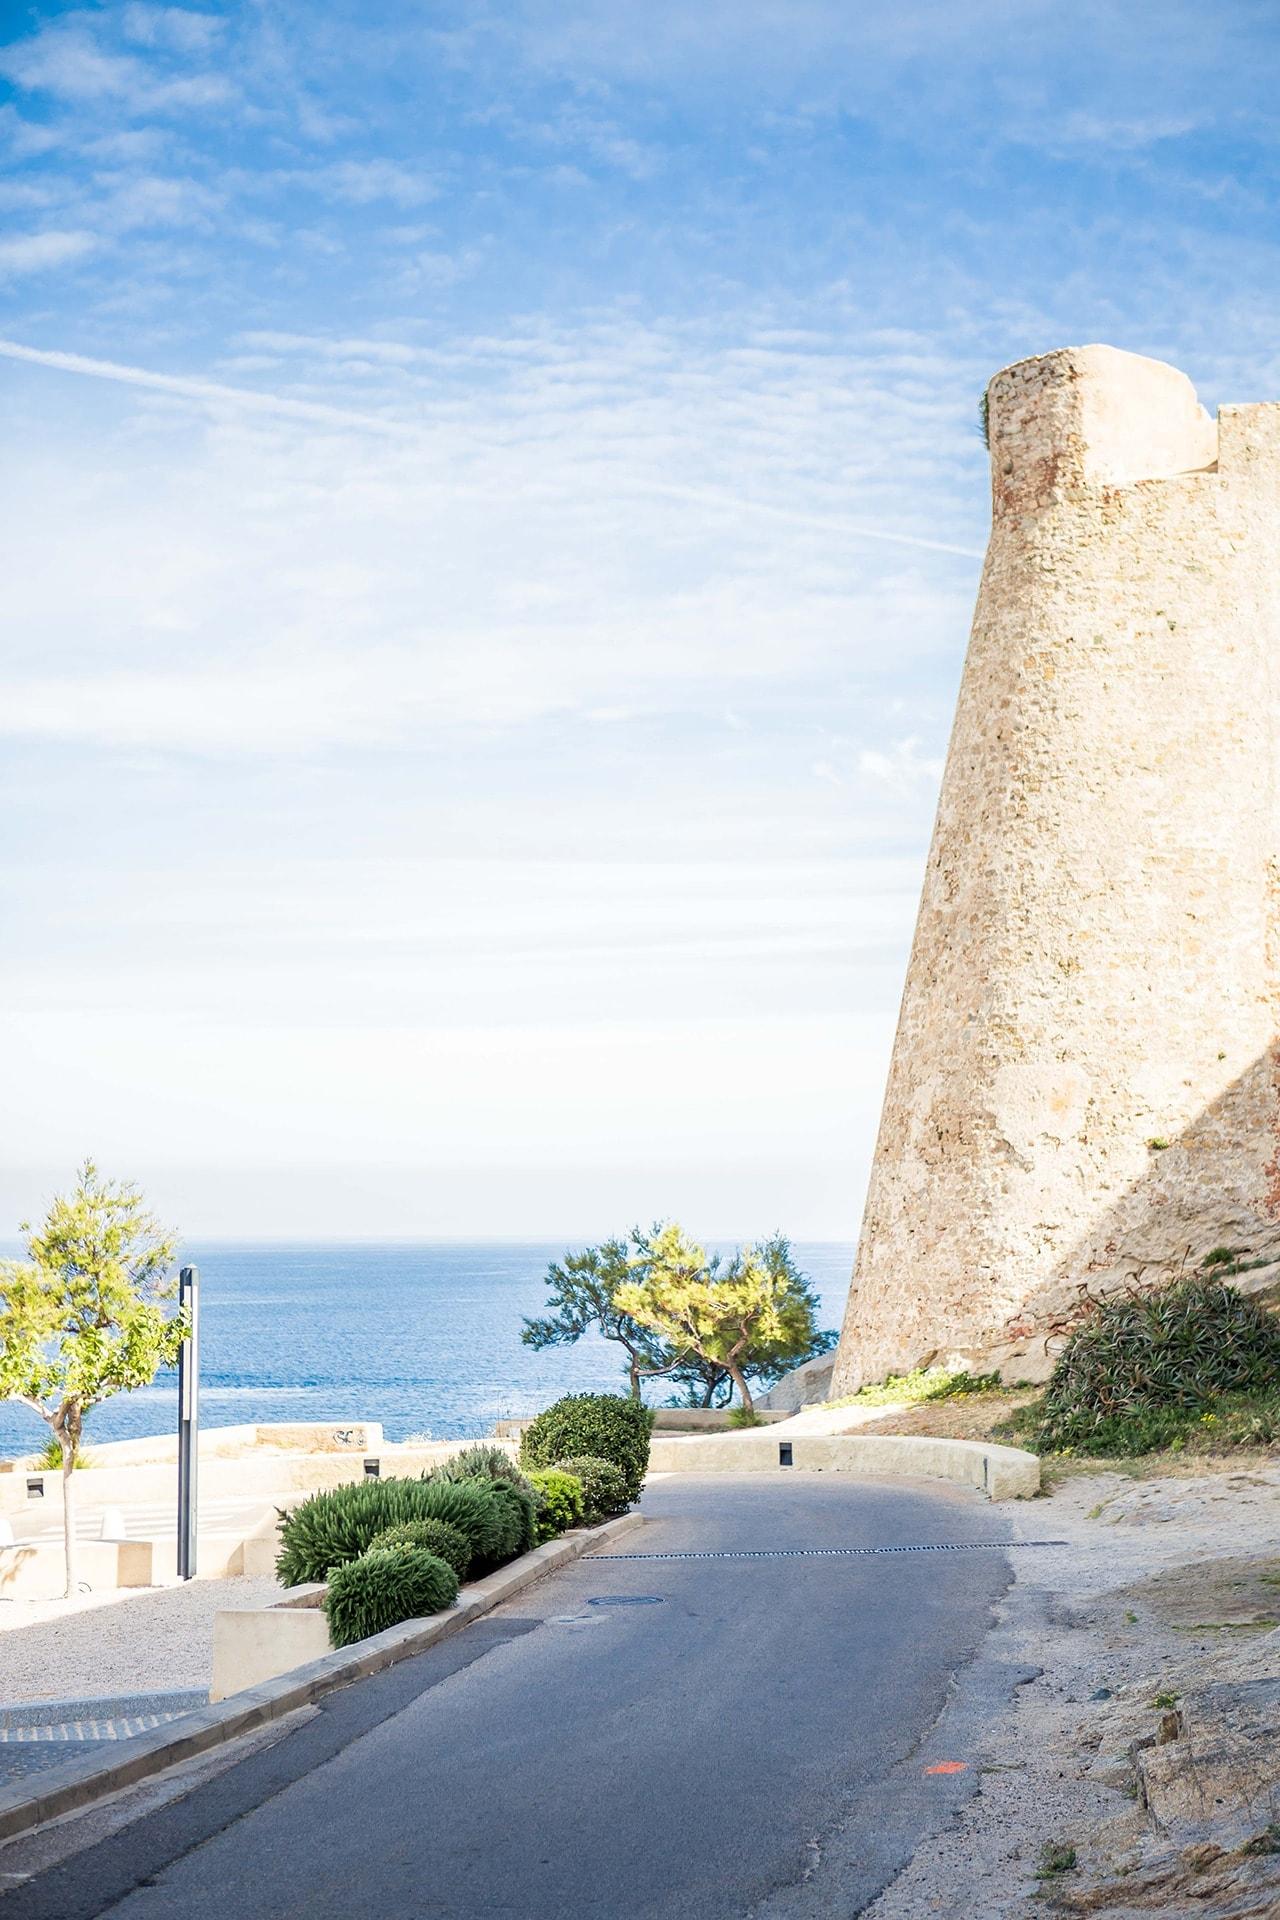 blog-voyage-sabine-kley-corse-balagne-calvi-citadelle